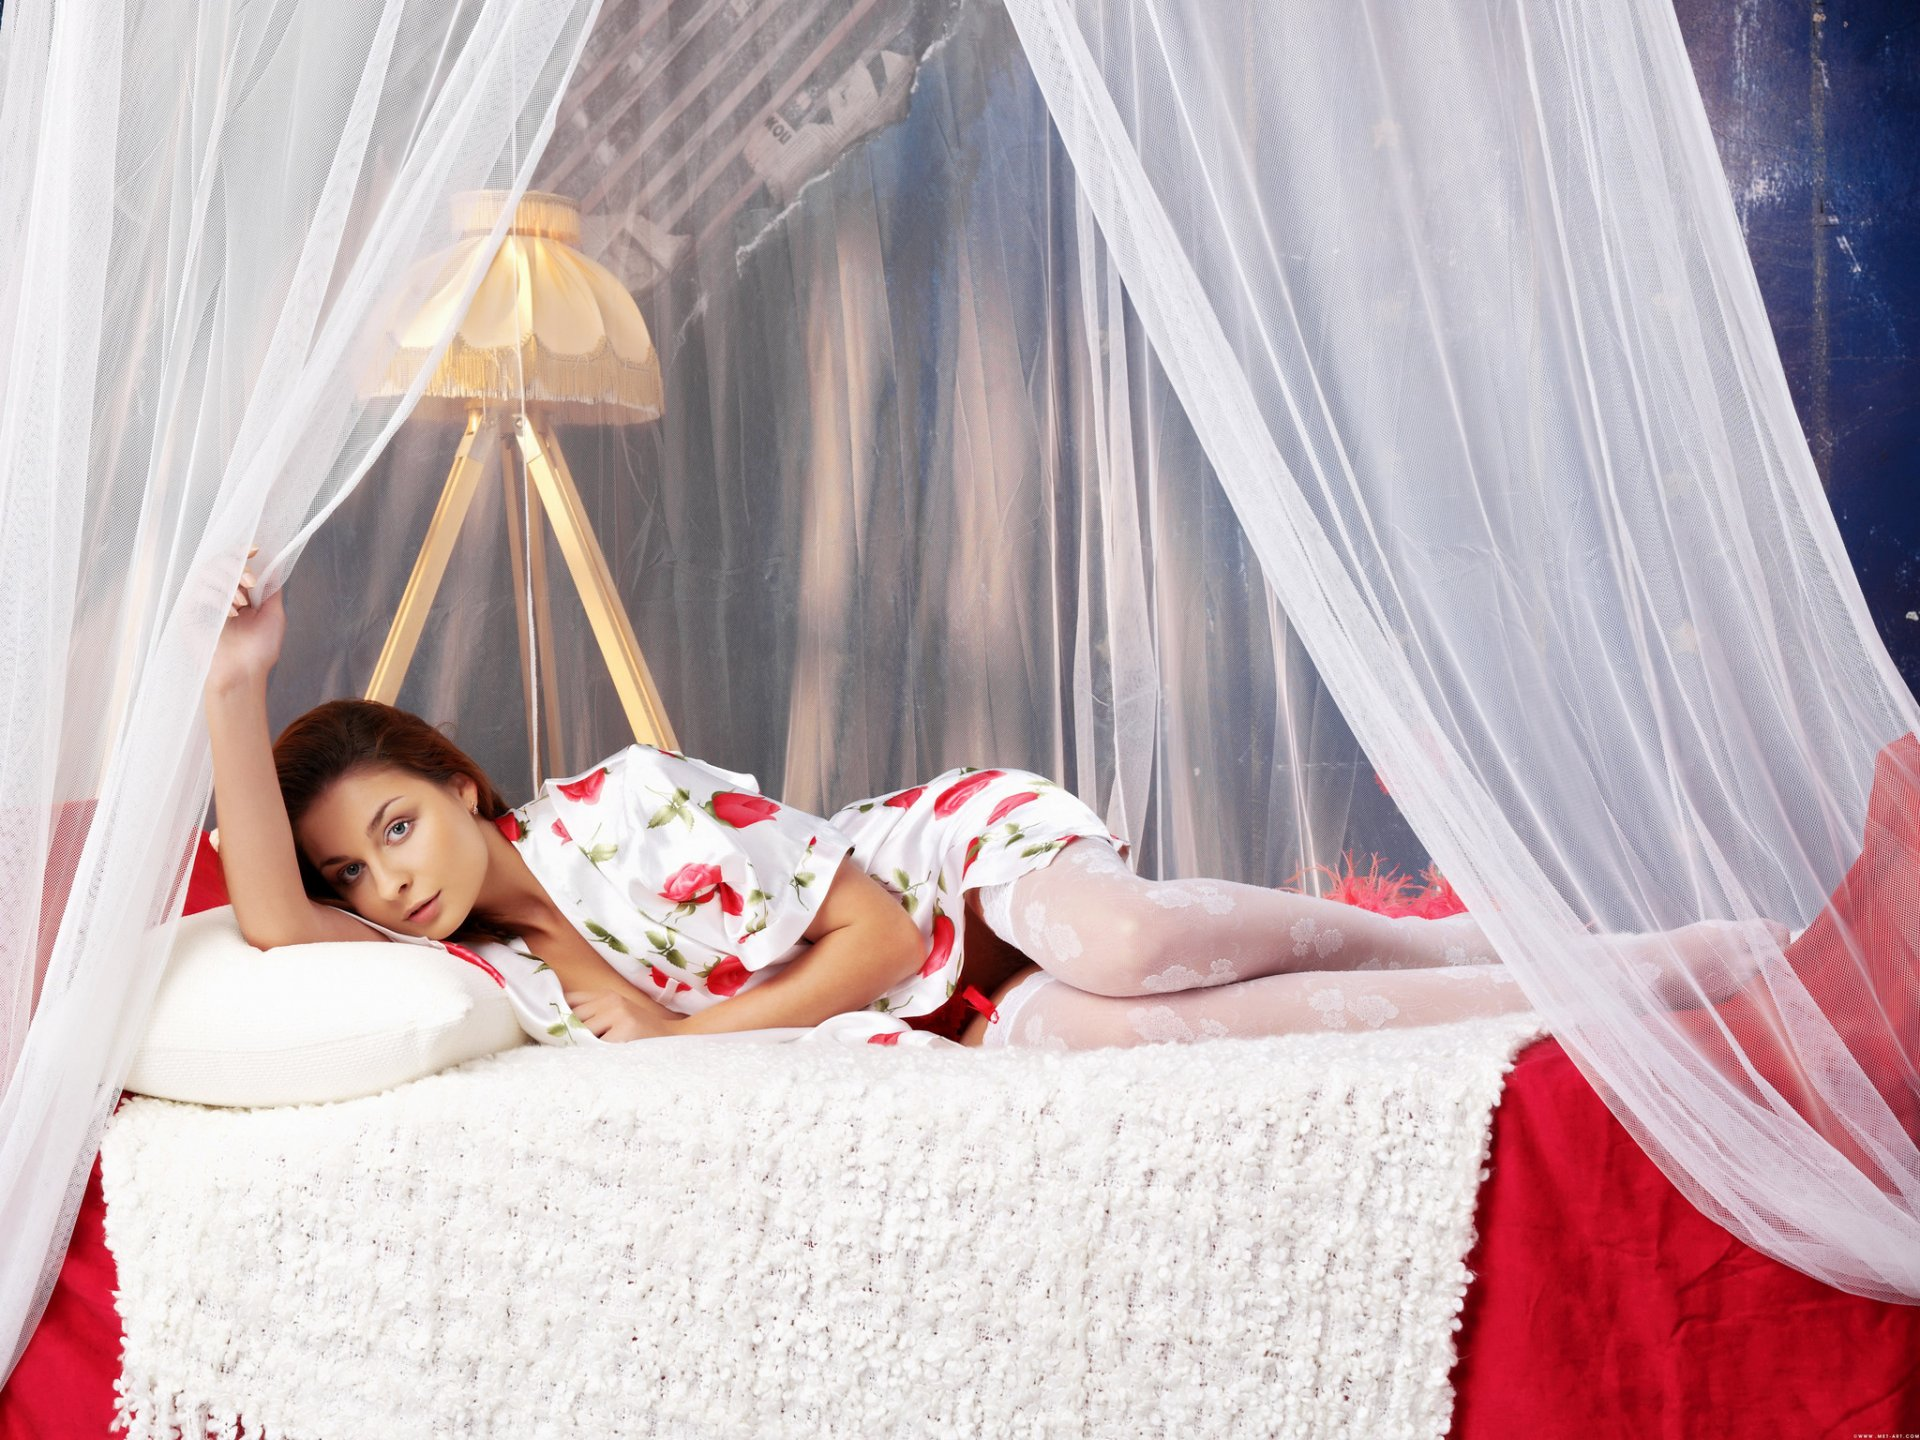 Сексфорум на кроватке